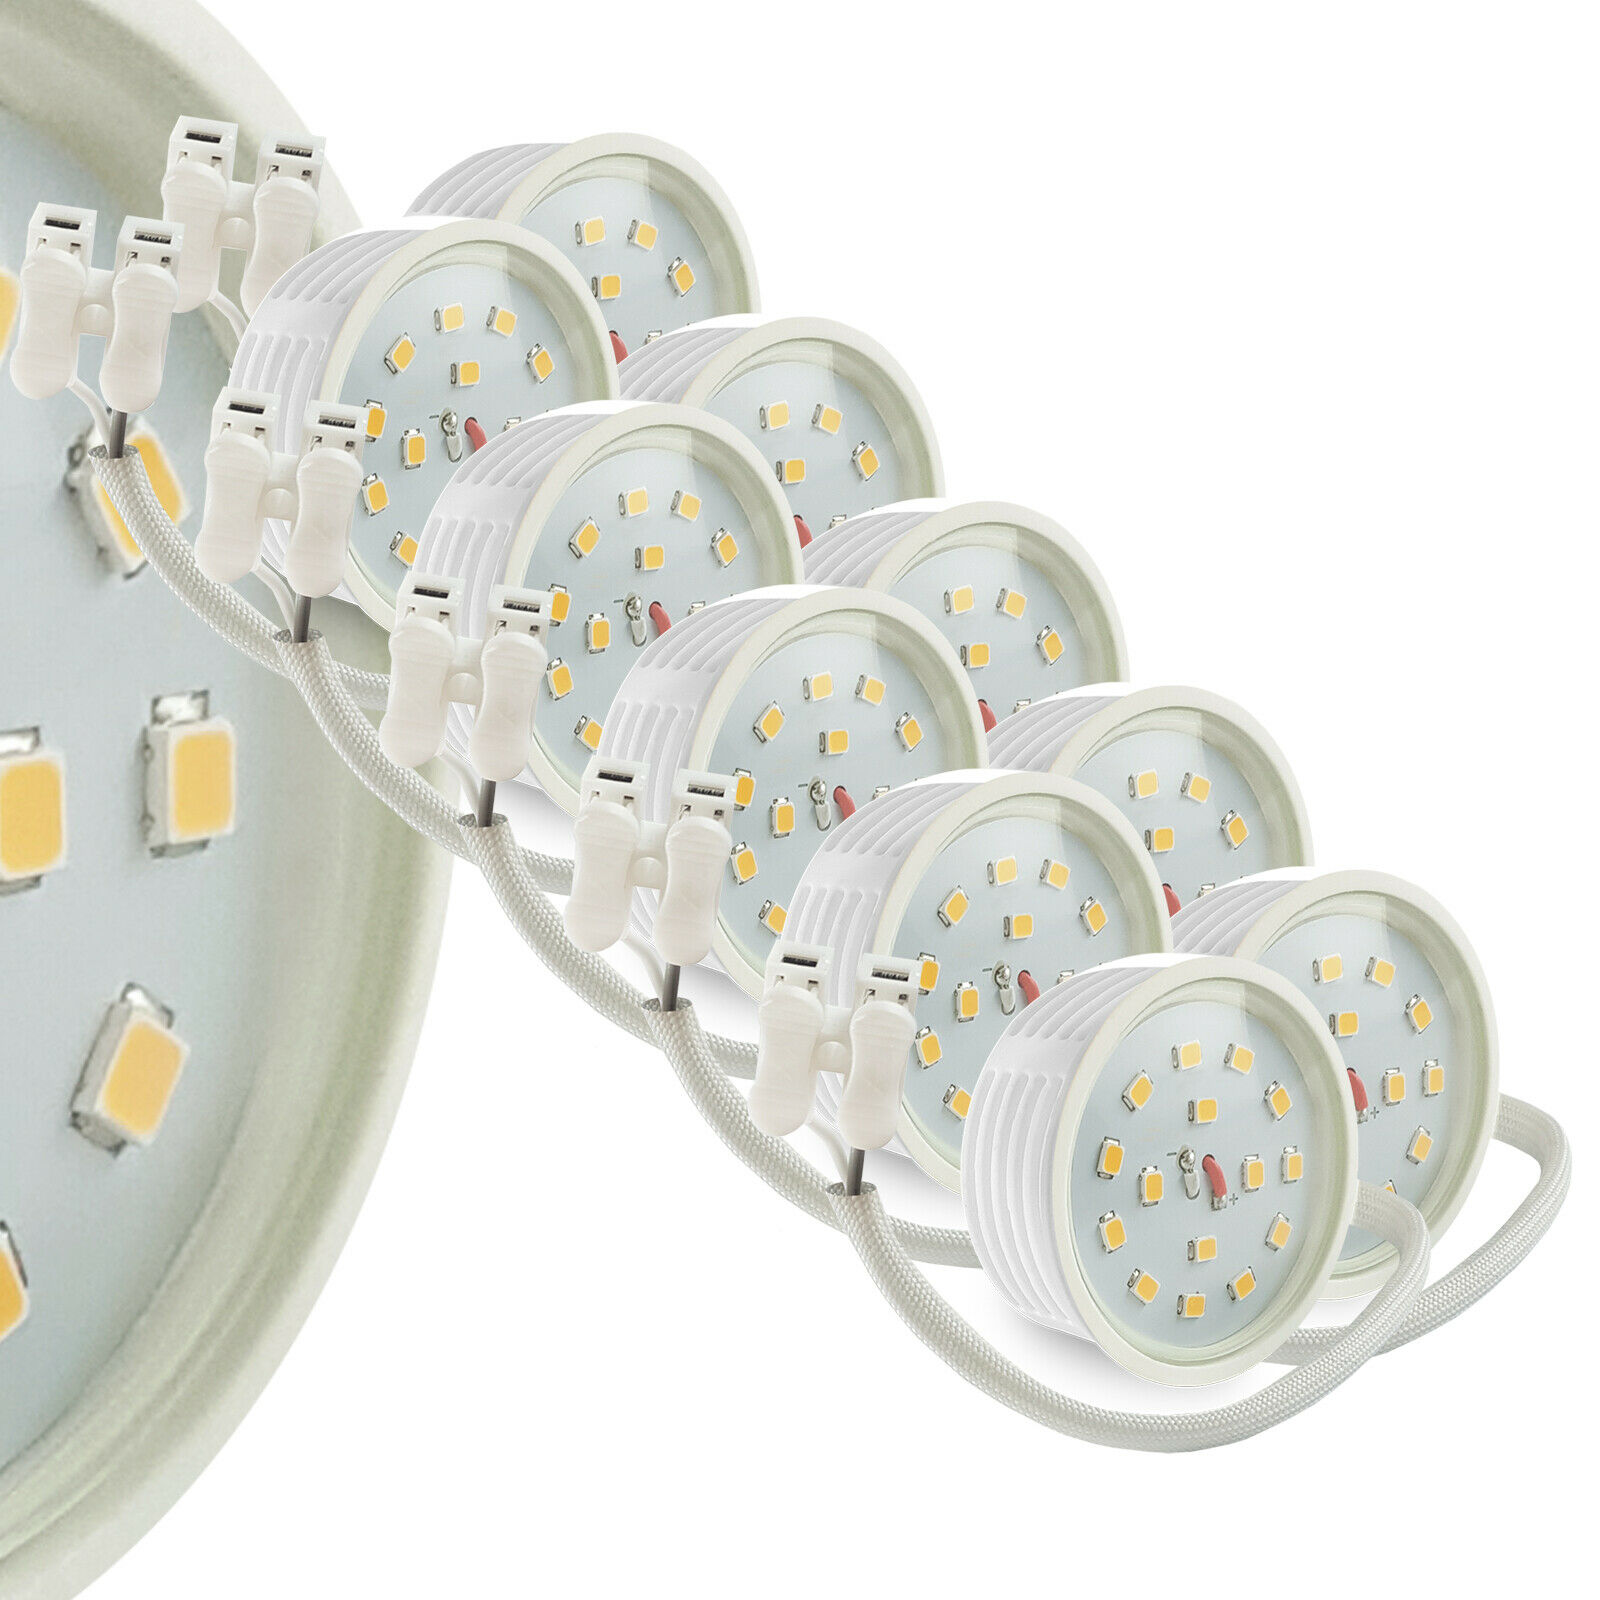 LED Leuchtmittel für Einbaustrahler Ultra Flach Flat 22mm 5W SMD dimmbar 230V